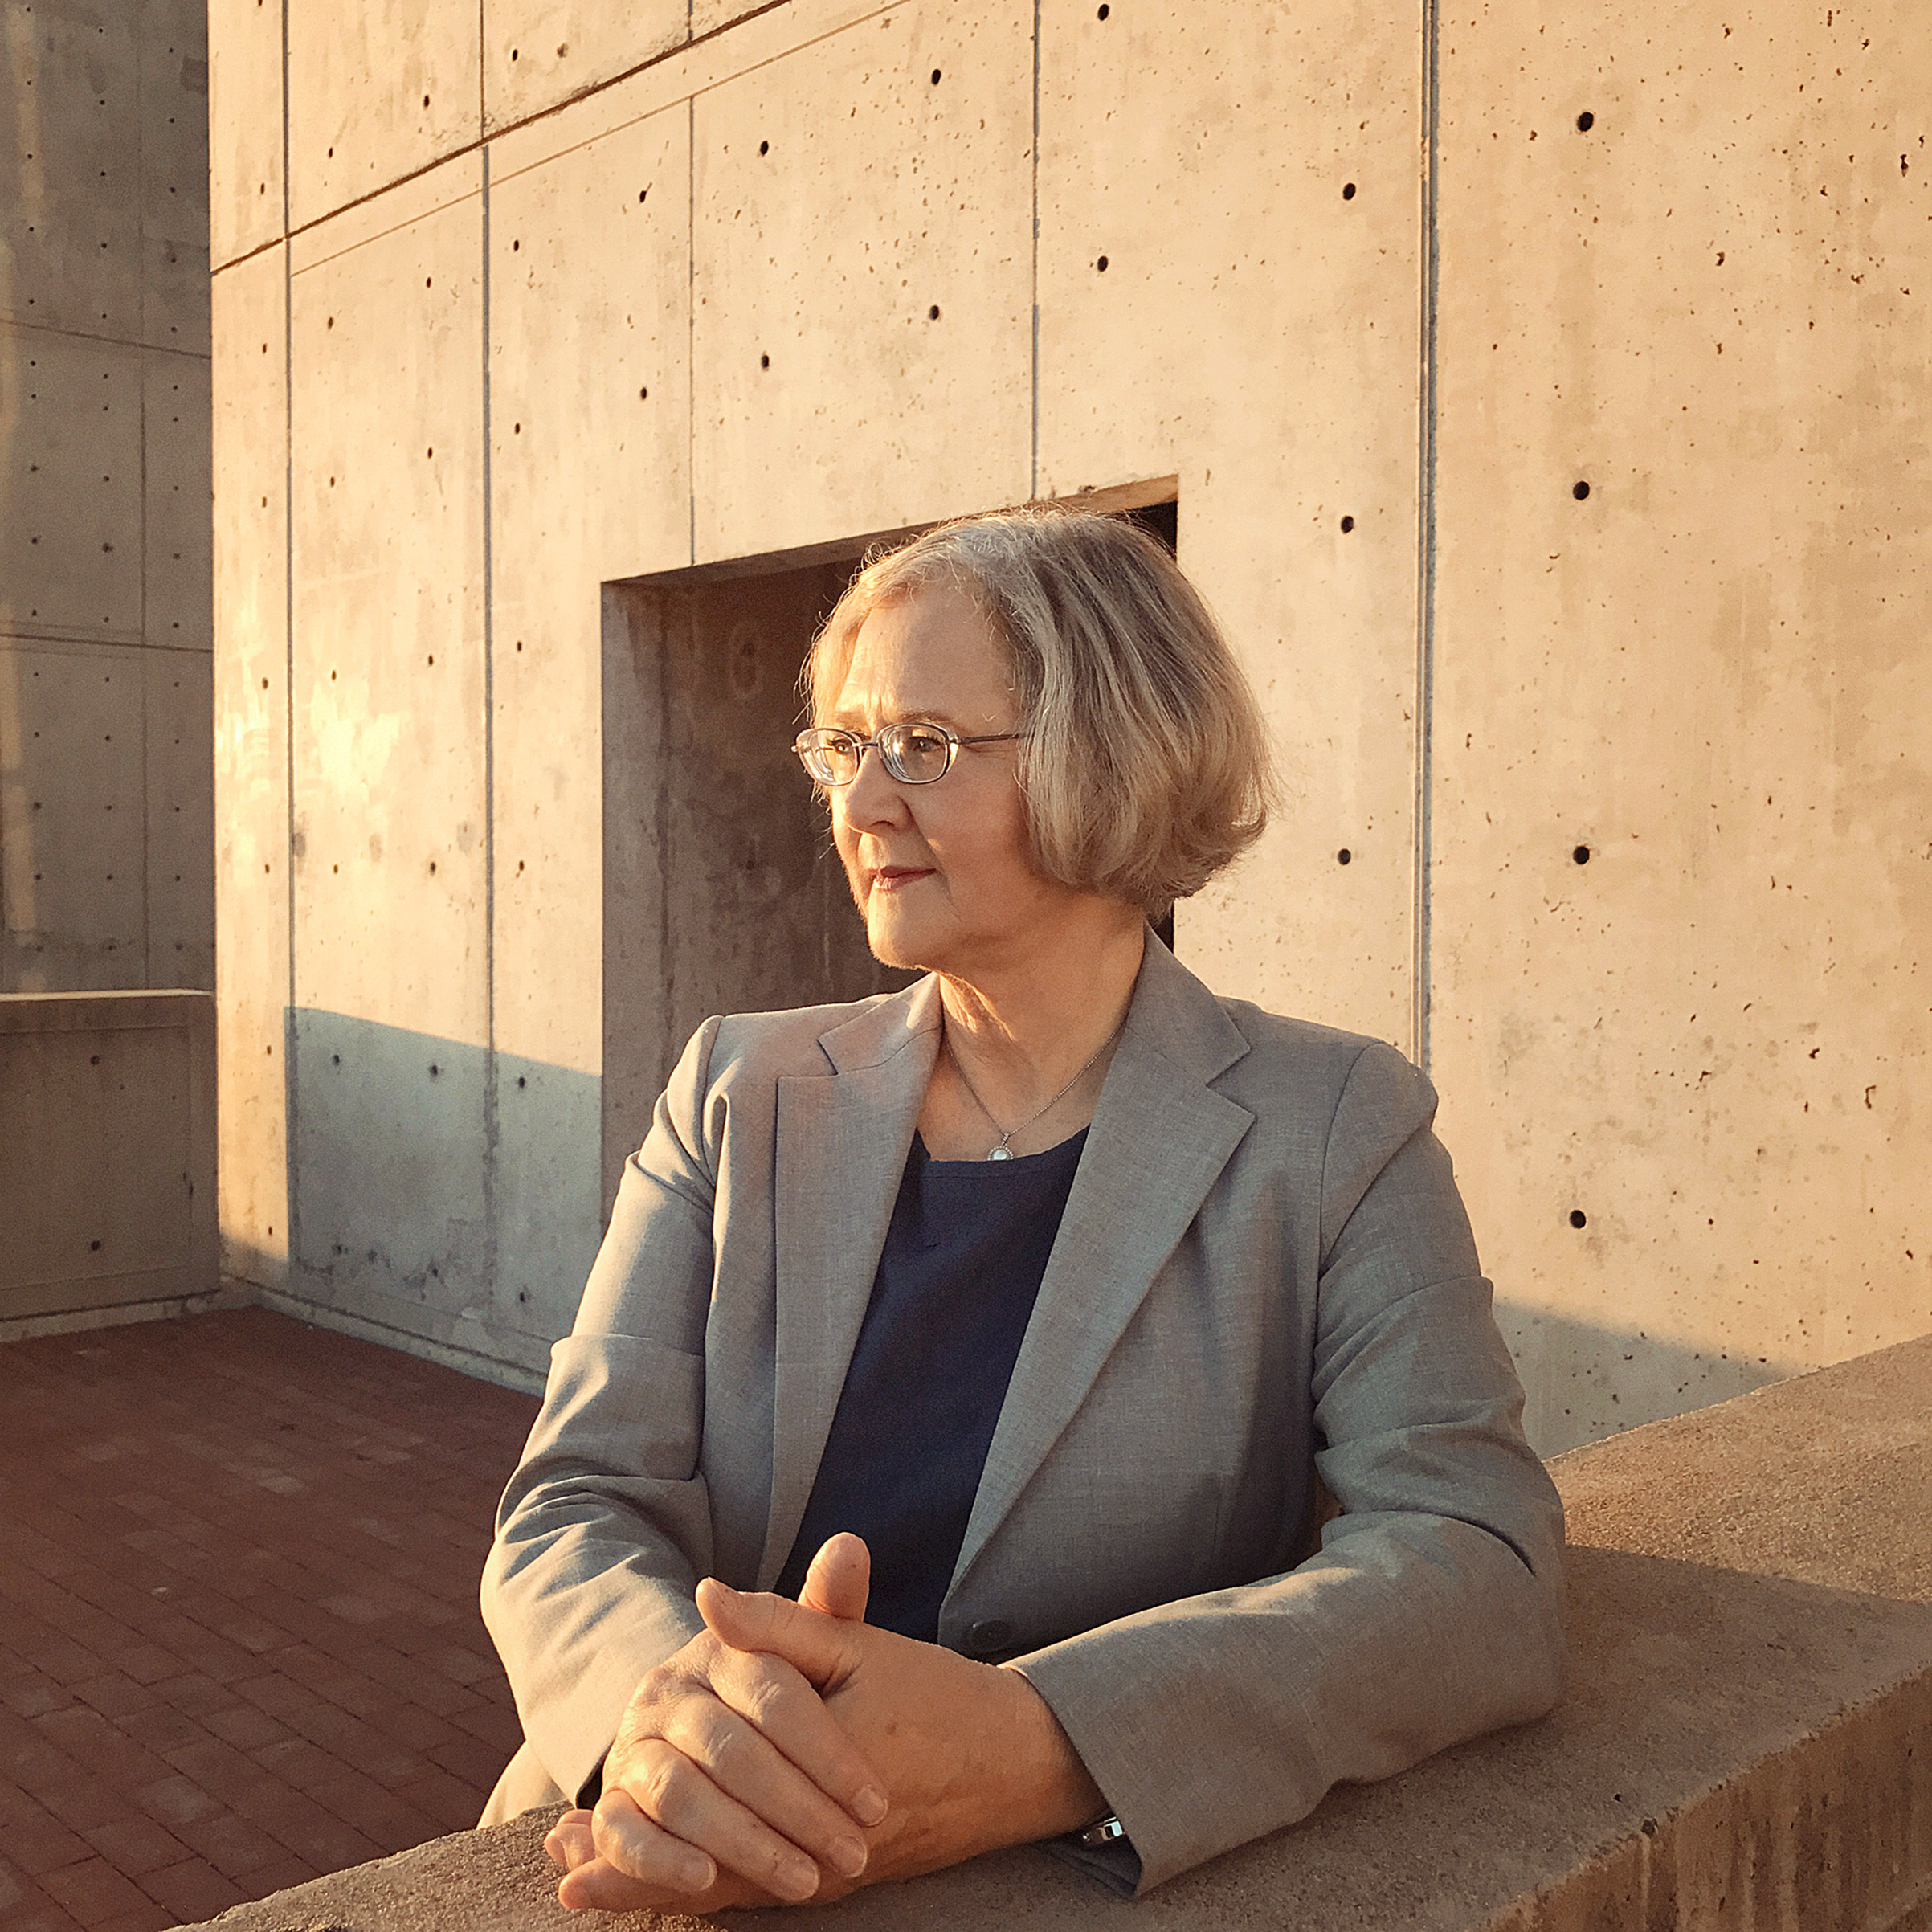 Portrait of Elizabeth Blackburn, photographed at the SALK Institute in La Jolla, CA, October 19, 2016.